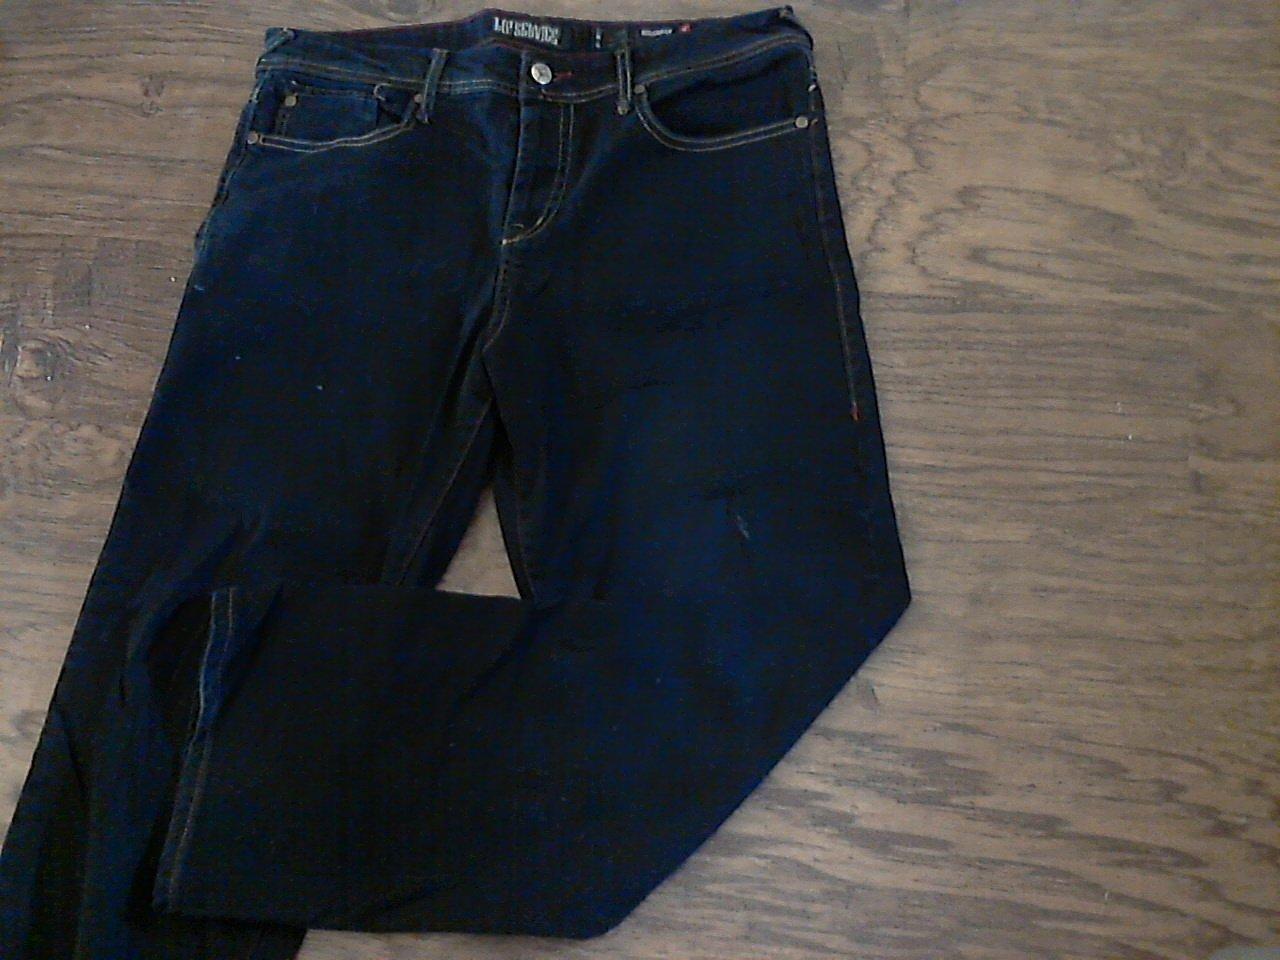 Rockaway man's black denim pant size 34/30